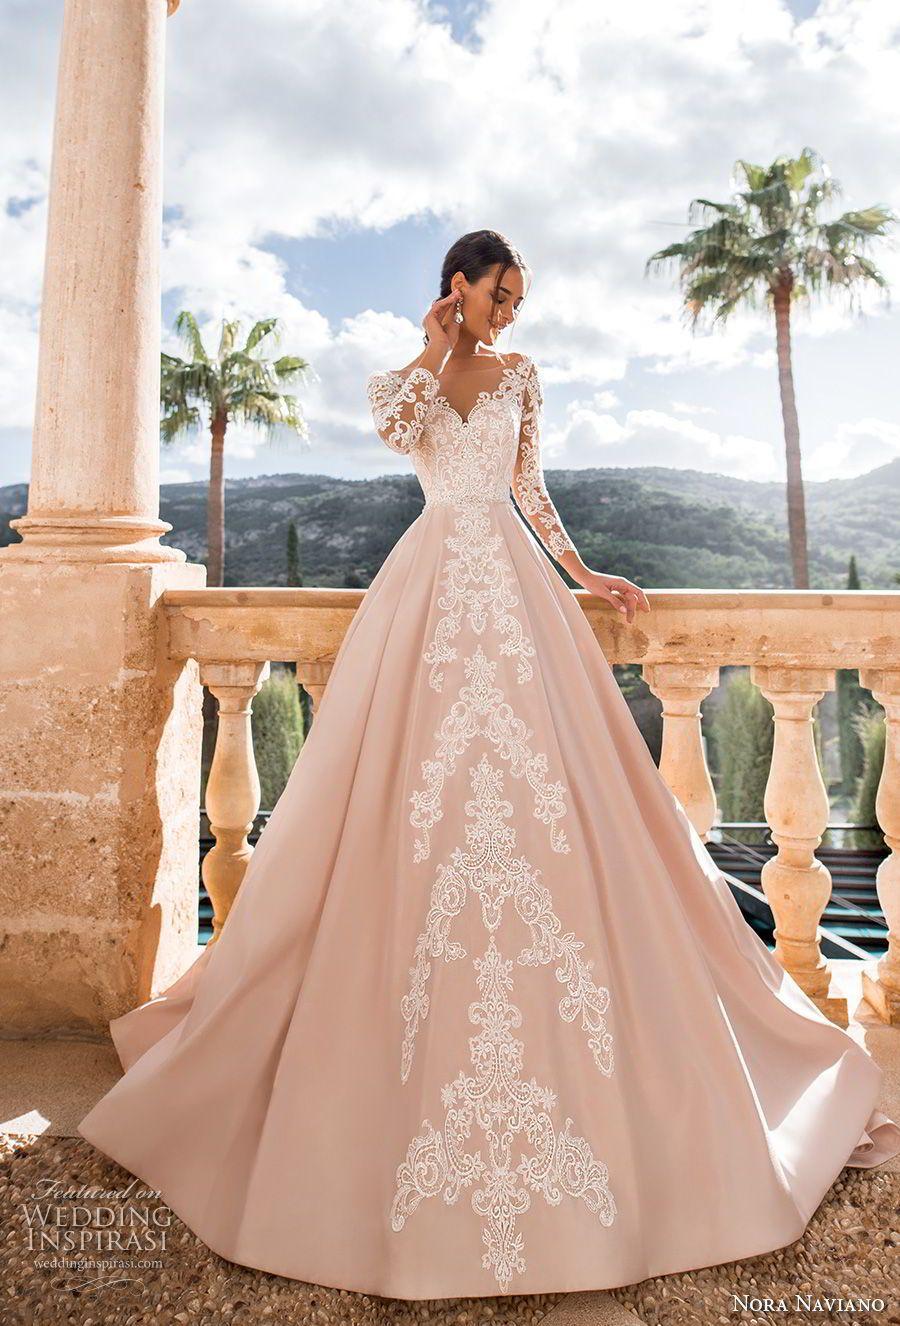 Nora Naviano 2019 Wedding Dresses Voyage Bridal Collection Wedding Inspirasi Long Sleeve Bridal Gown Gothic Wedding Dress Muslim Wedding Dresses [ 1326 x 900 Pixel ]